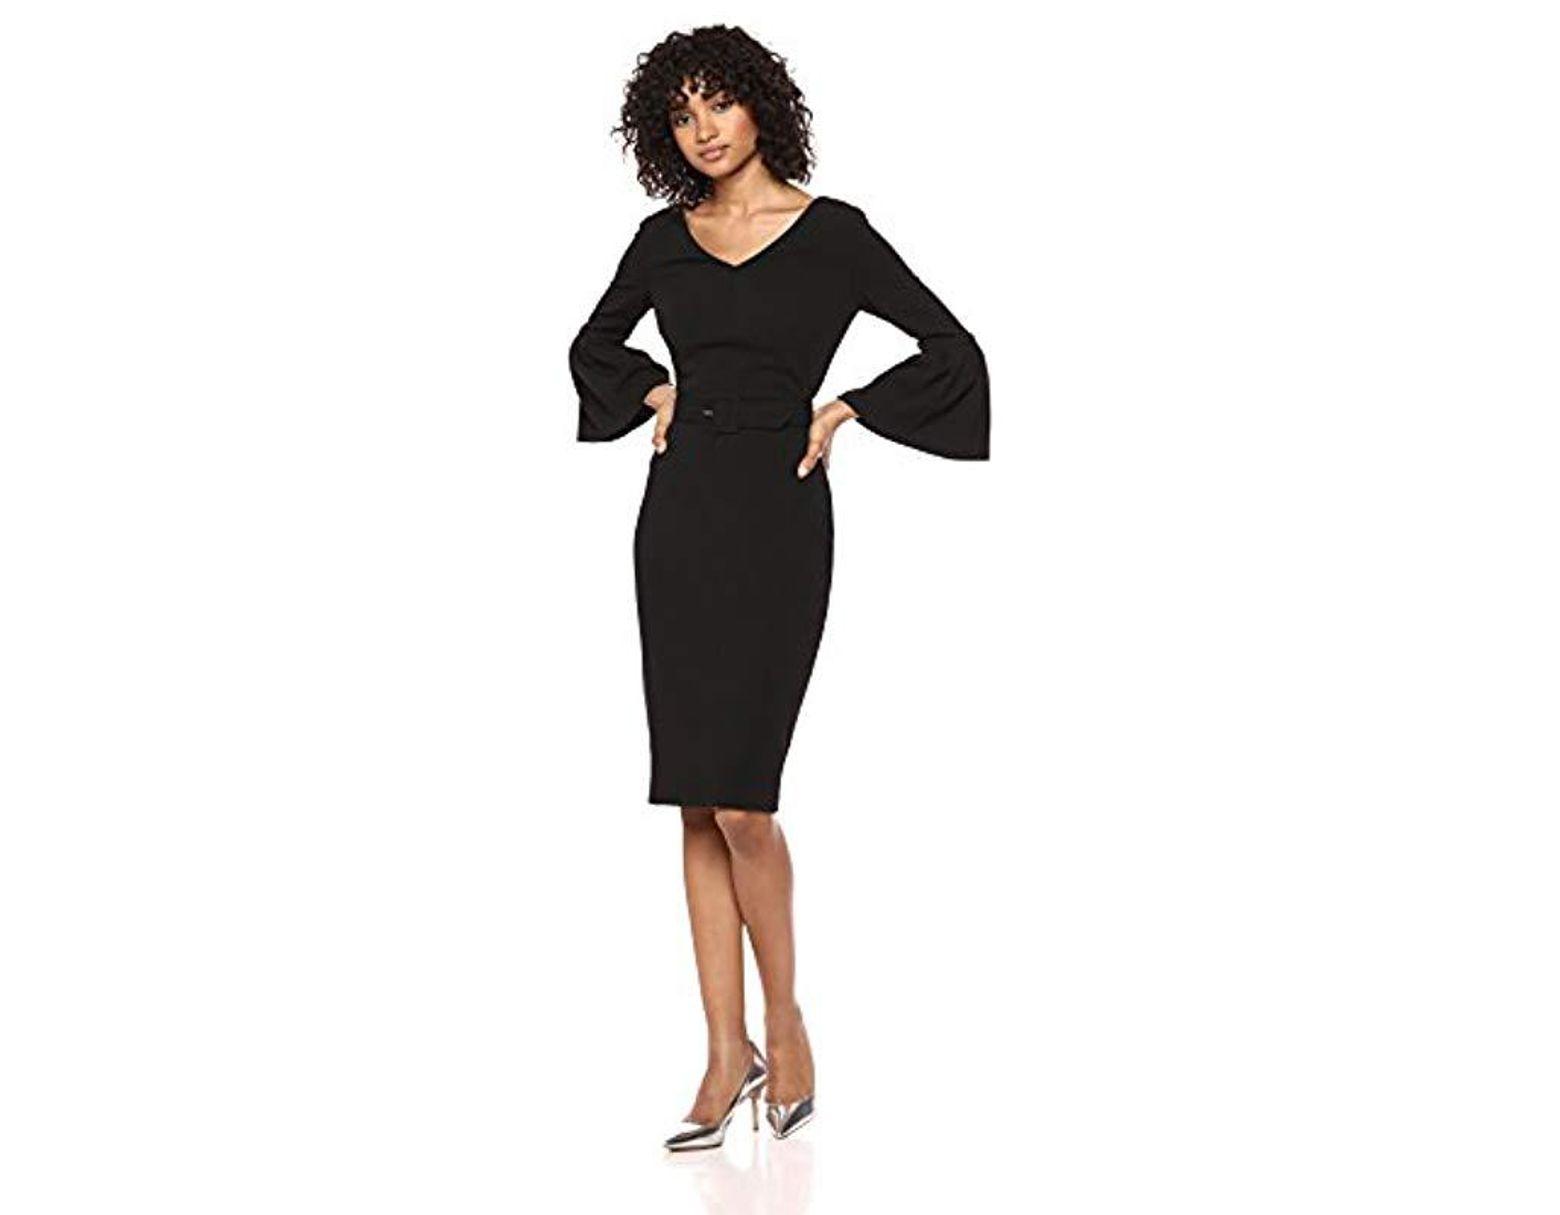 6d0414c1 Calvin Klein V-neck Bell Sleeve Sheath With Belt Dress in Black - Lyst